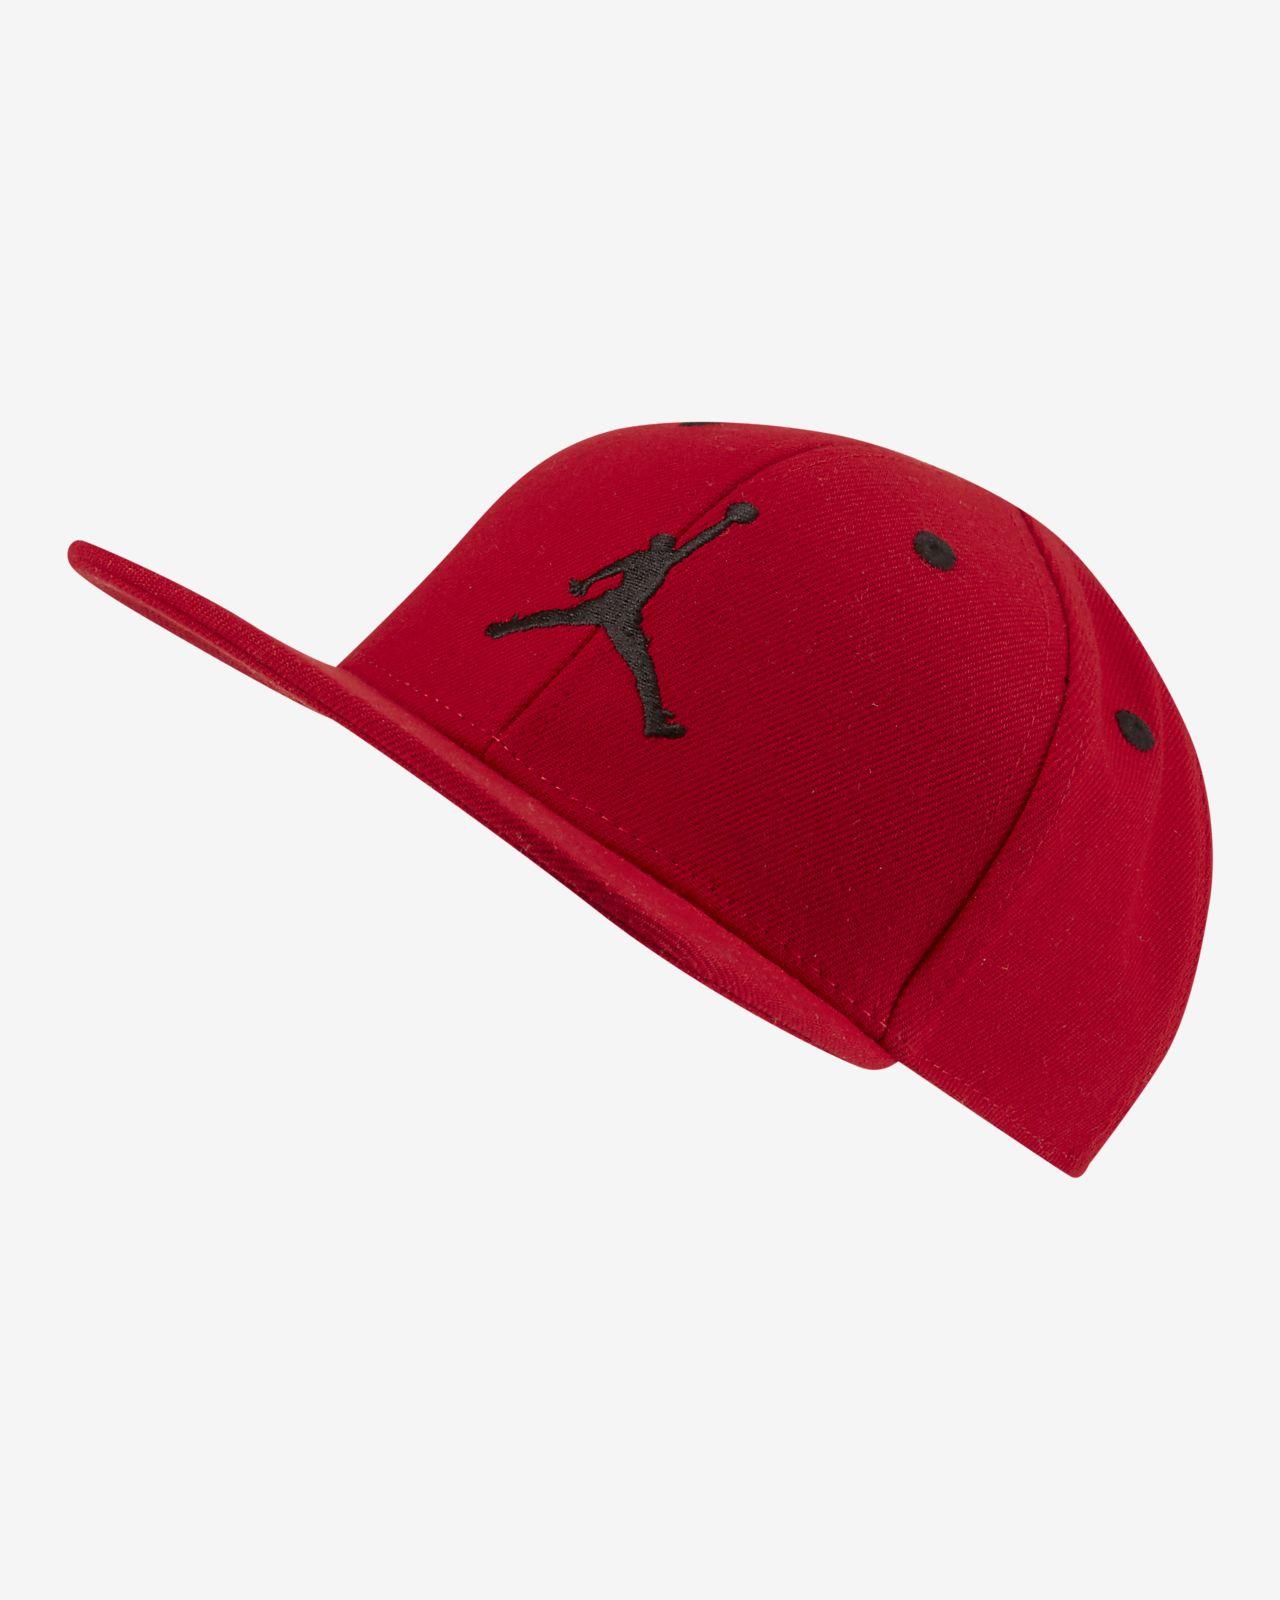 9ae62981817280 ... netherlands jordan big kids adjustable hat fd23d 6eee9